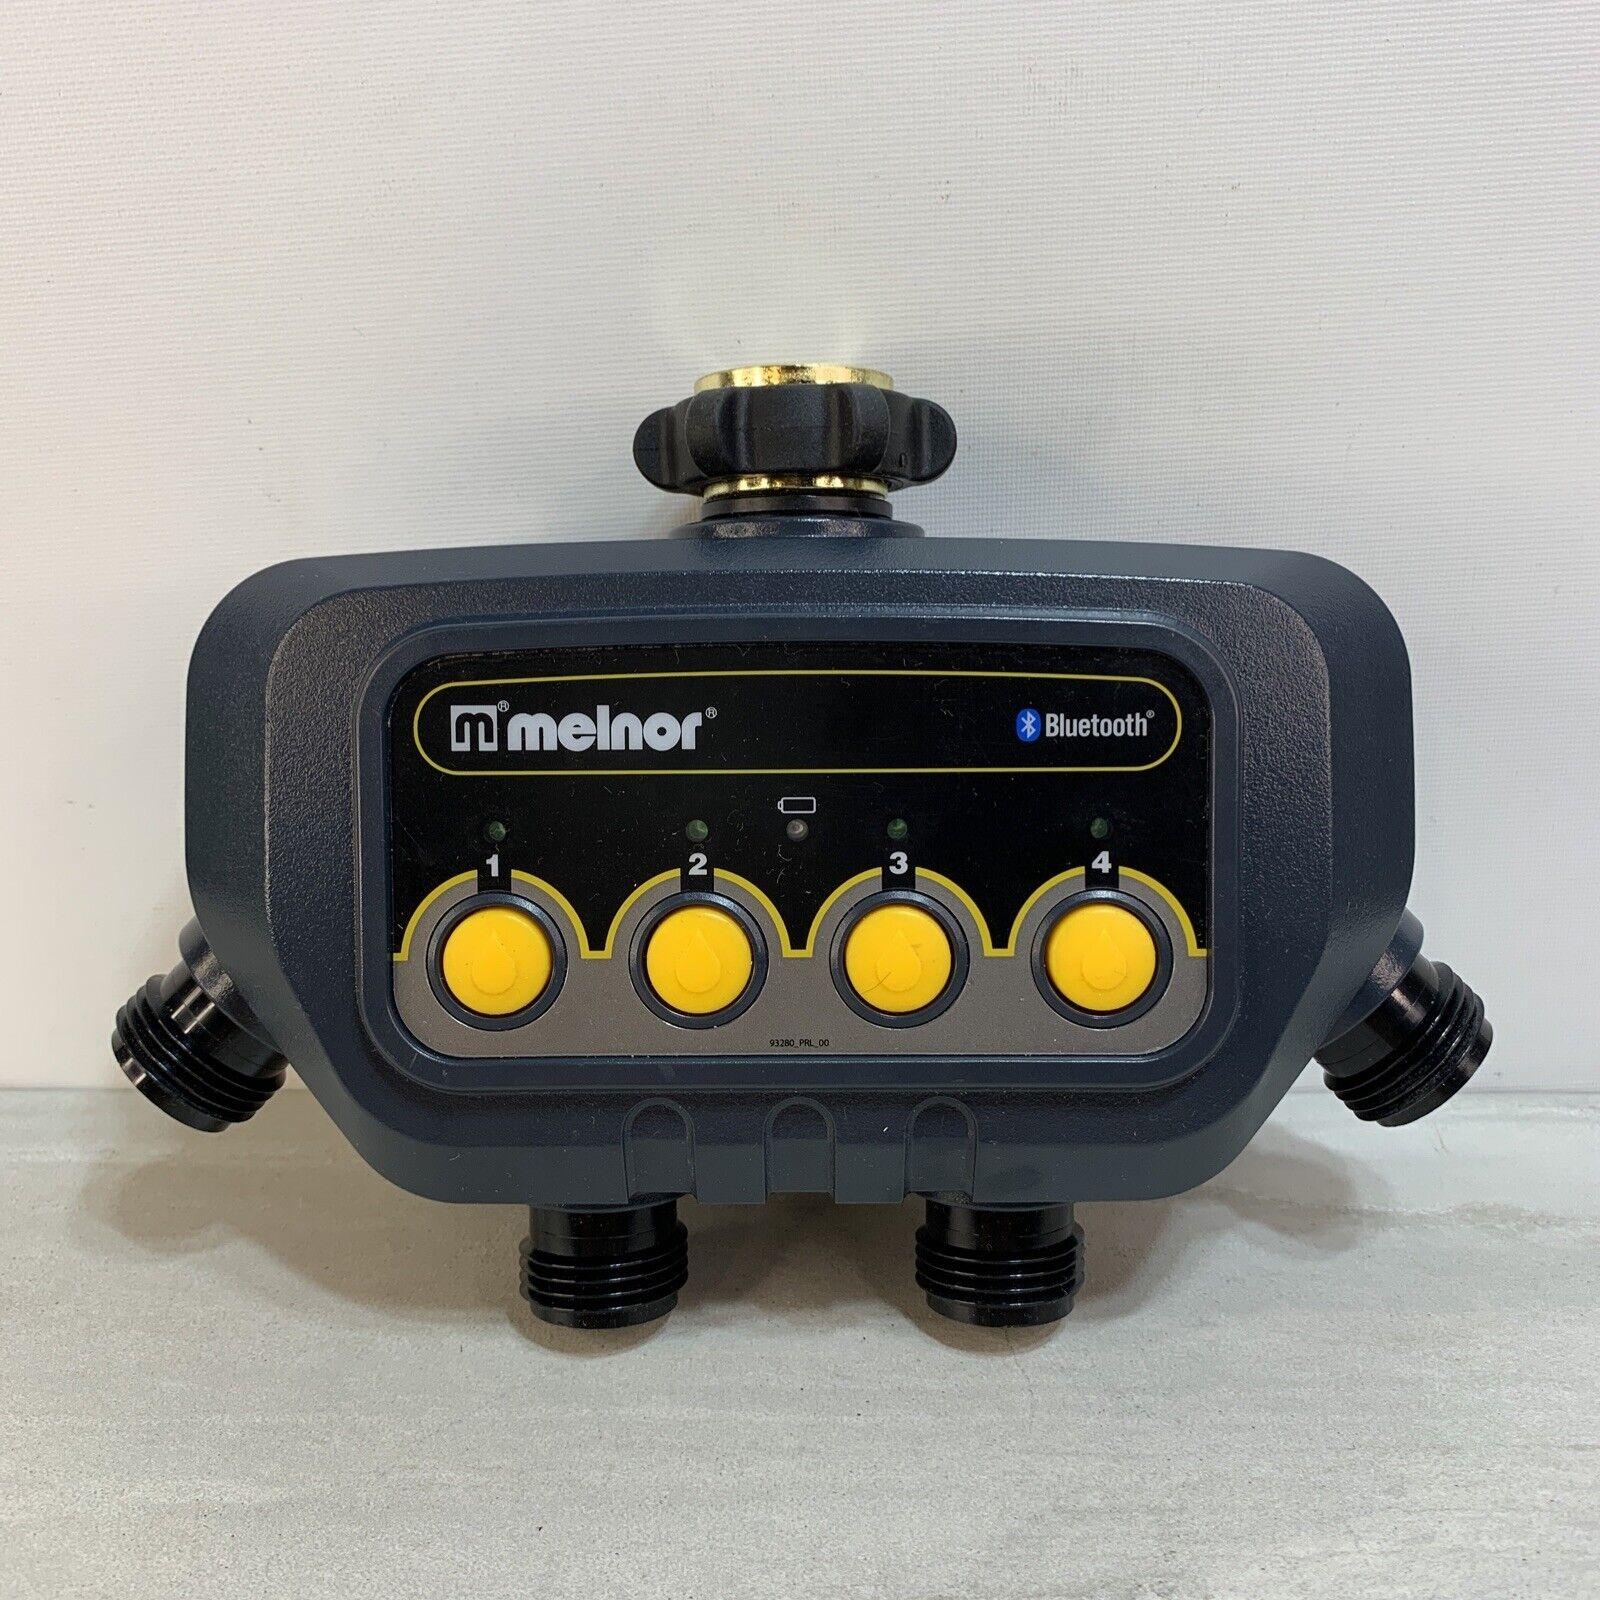 Melnor 93280 4-Zone Bluetooth Water Timer - Open Box